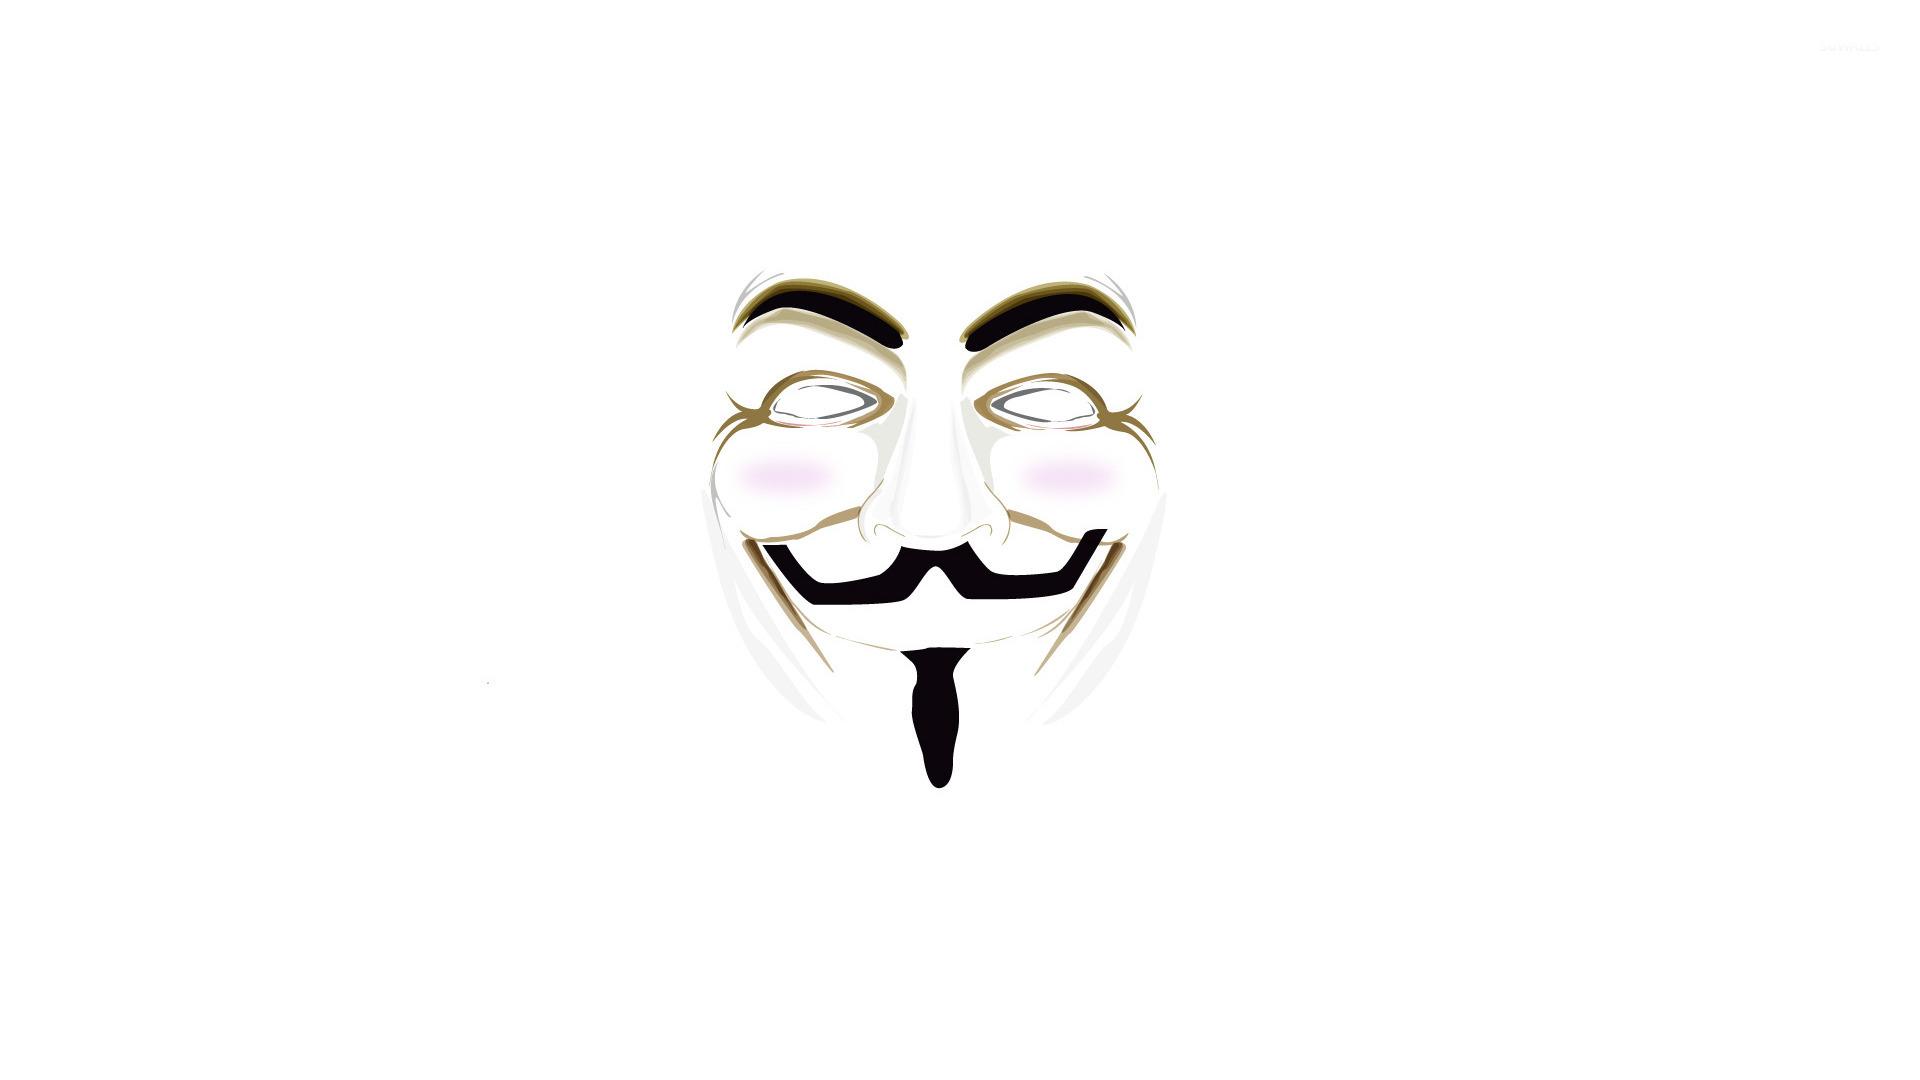 Joker Quotes Wallpaper Hd Anonymous 5 Wallpaper Meme Wallpapers 15877